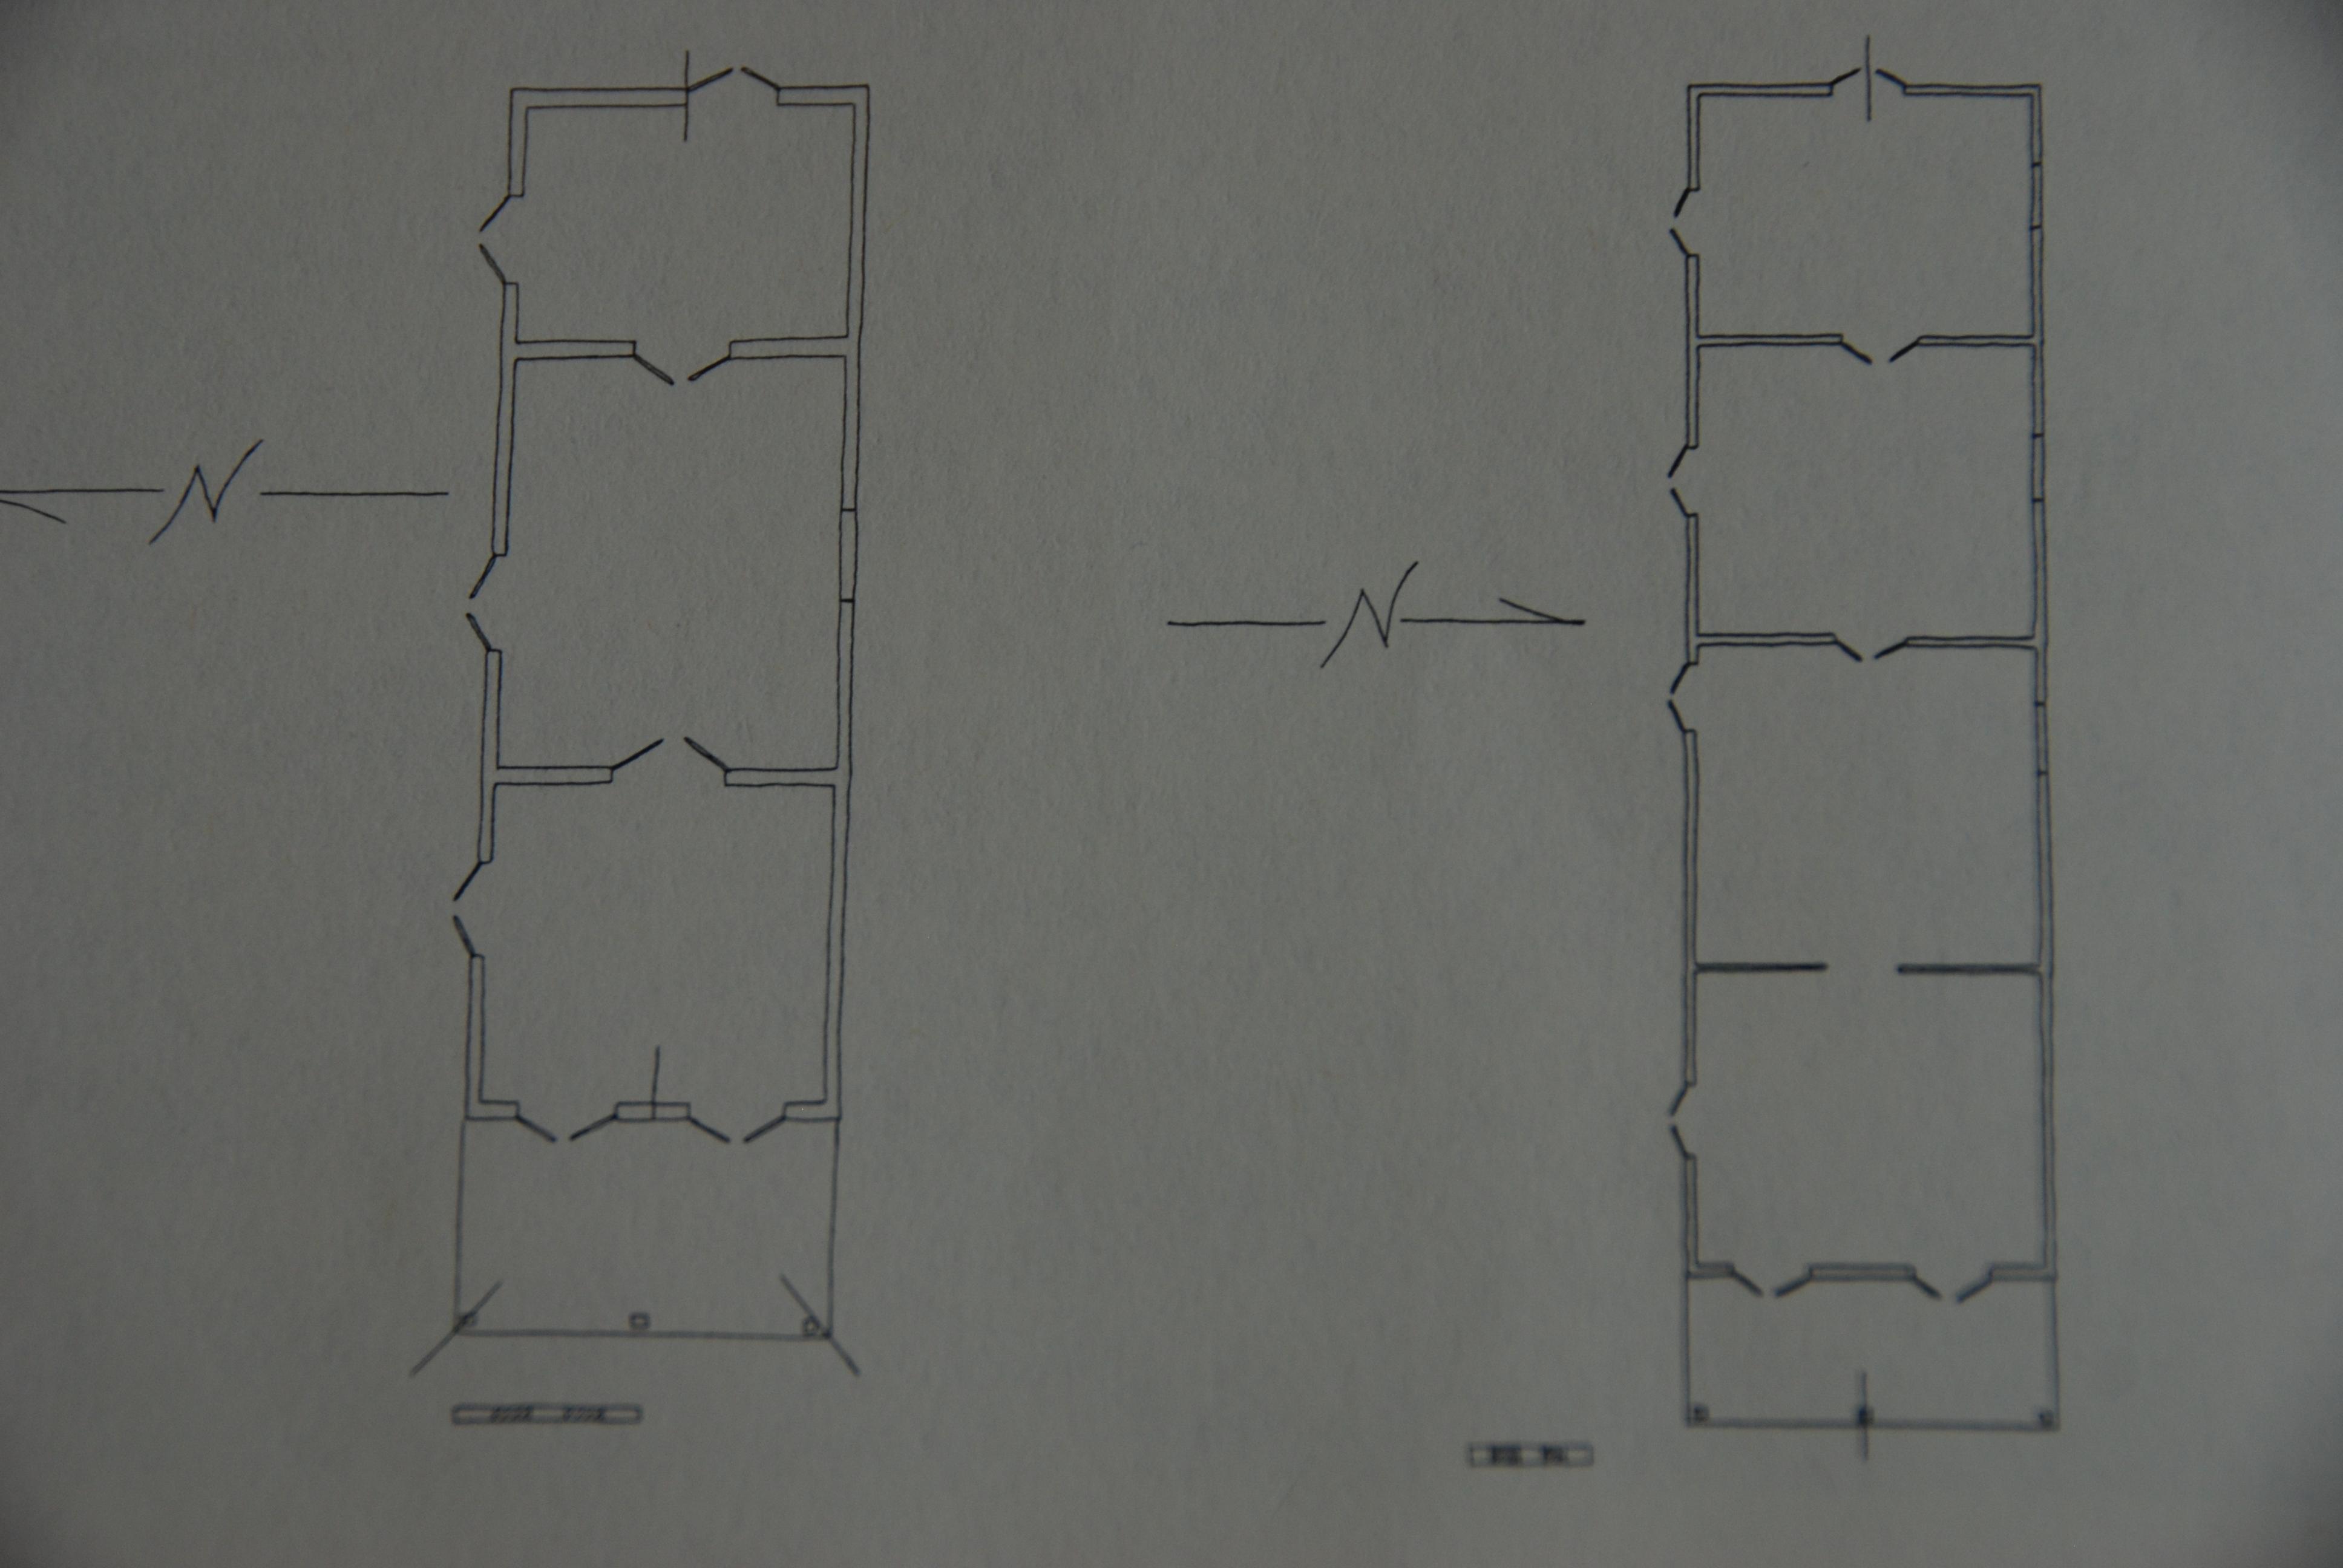 ... Traditional Haitian Maison-Basse Plans (Upton & Vlach, 1986: 65